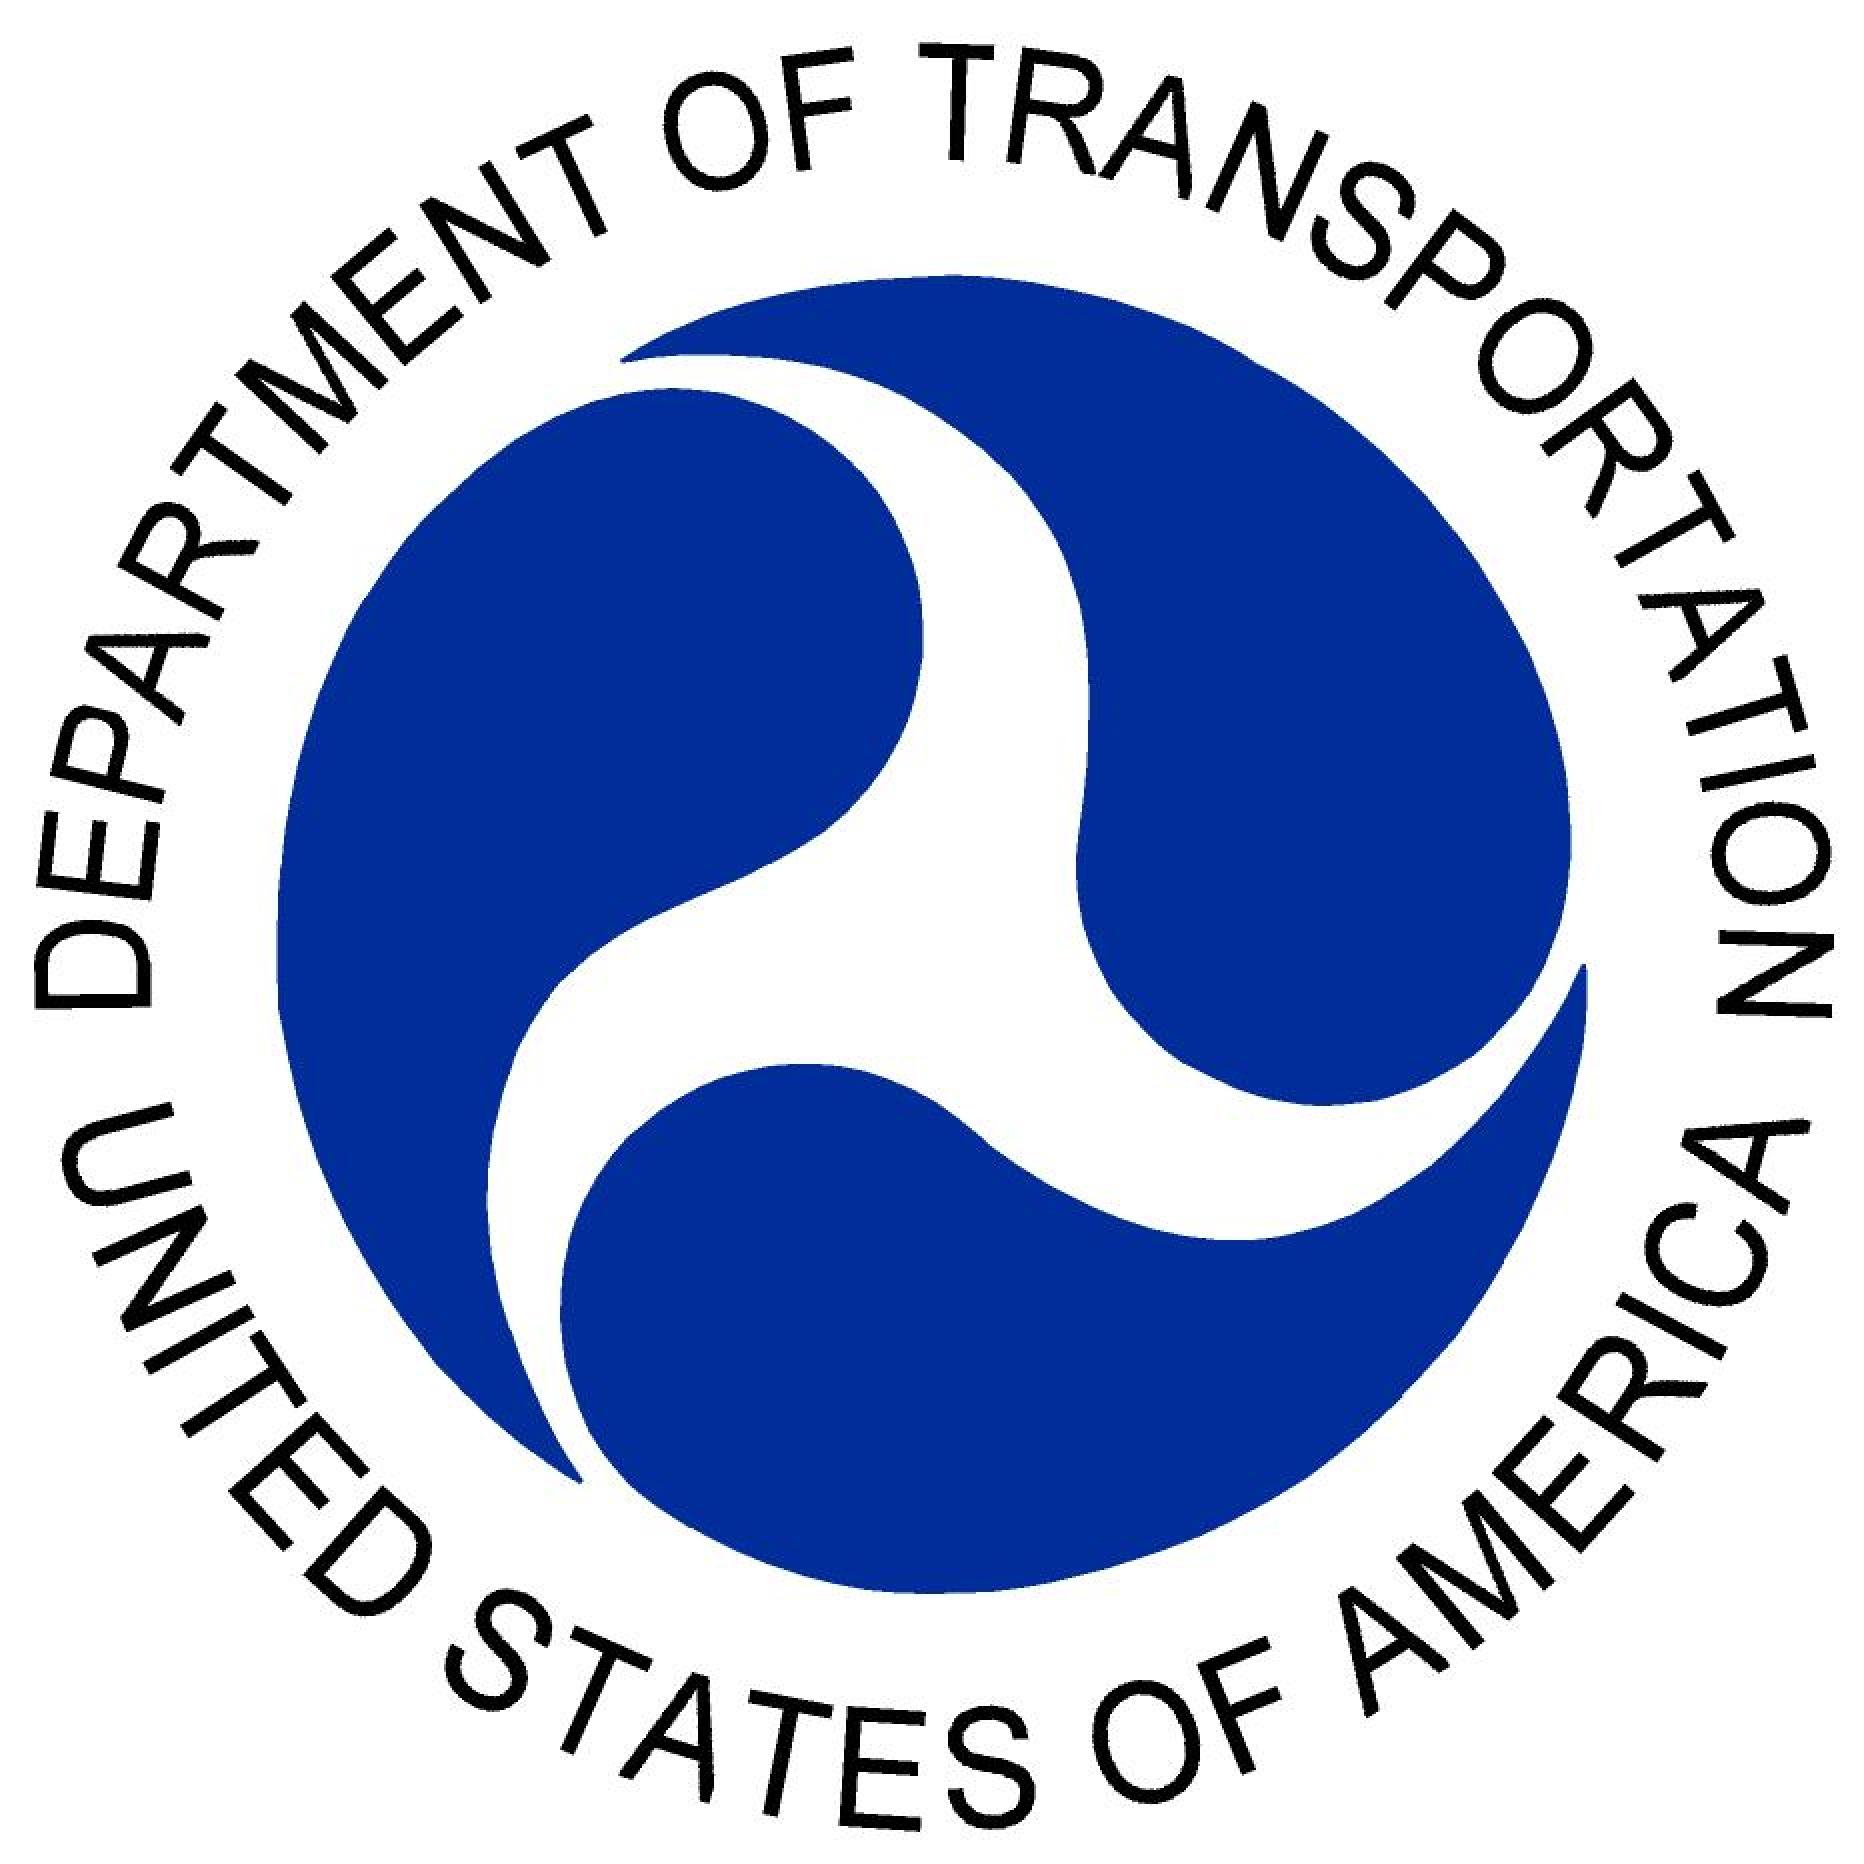 Dep of transportation